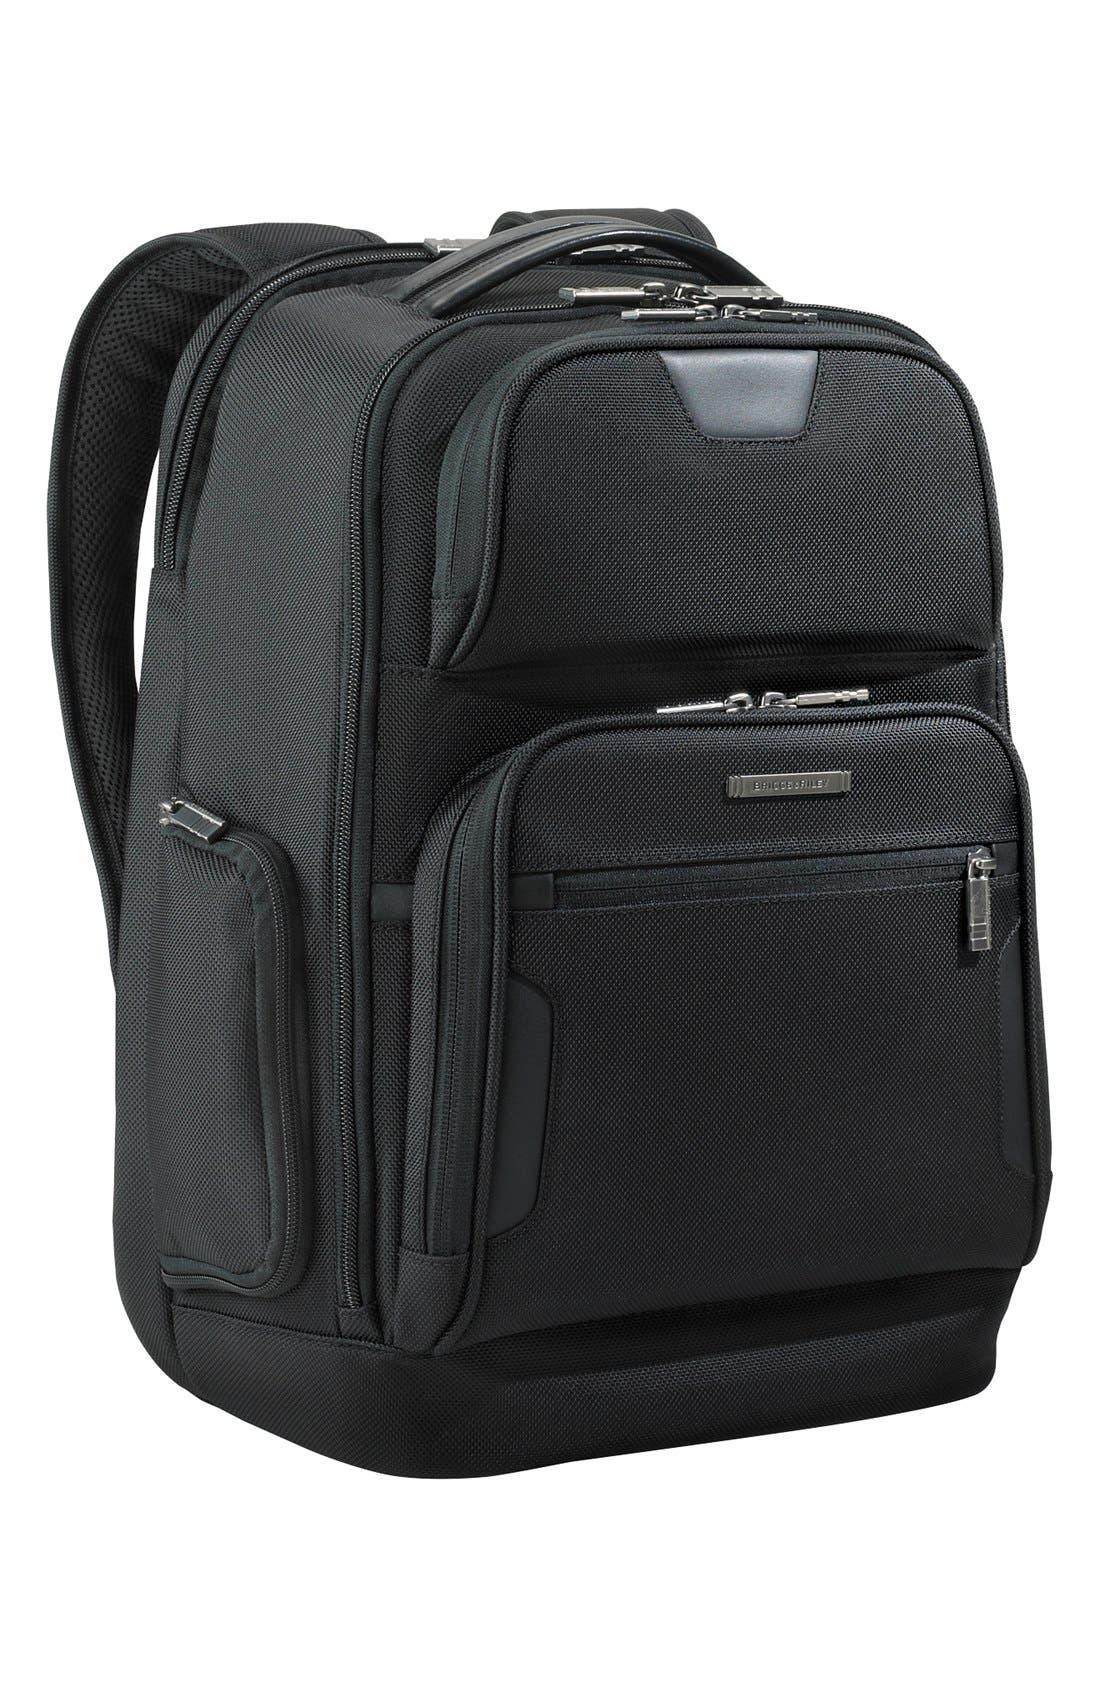 Medium Ballistic Nylon Backpack,                         Main,                         color,